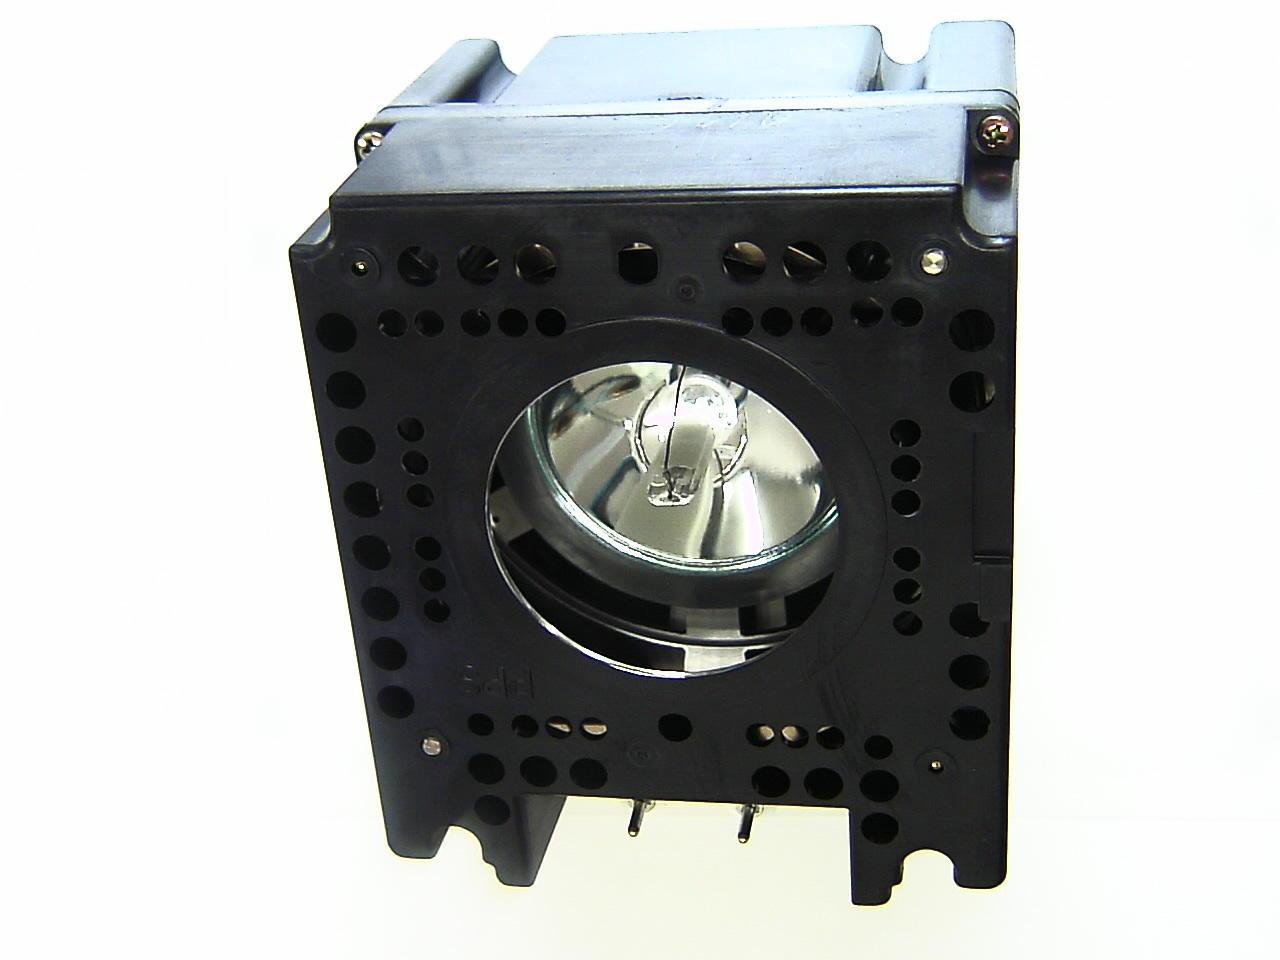 3M Original Lamp For 3M MP8020 Projector